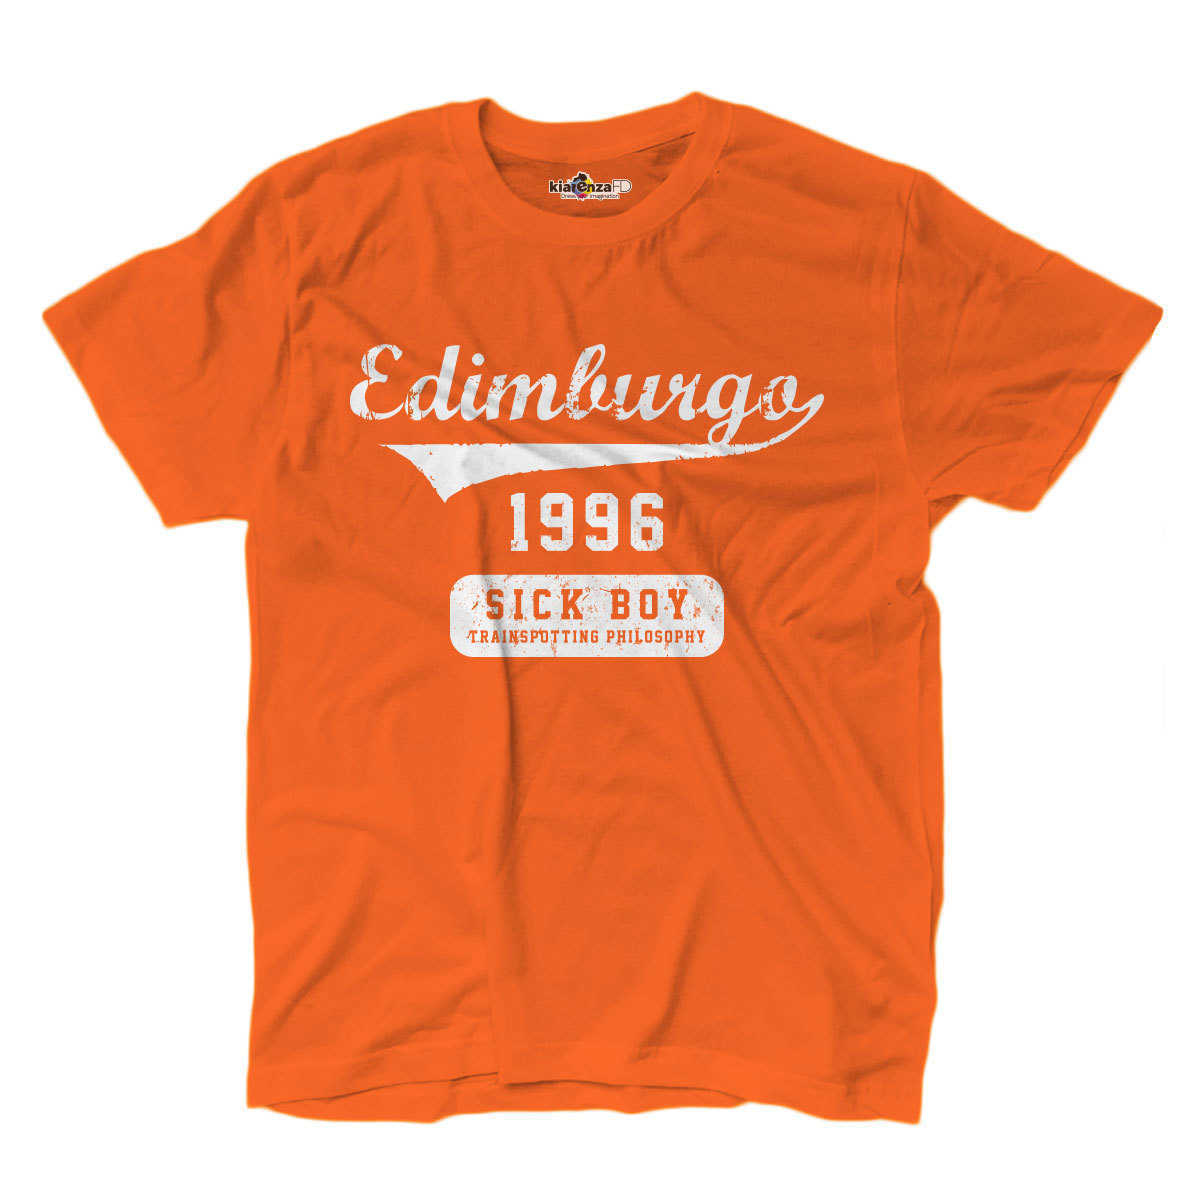 T-shirts sick boy edinburgh film cult 3 s